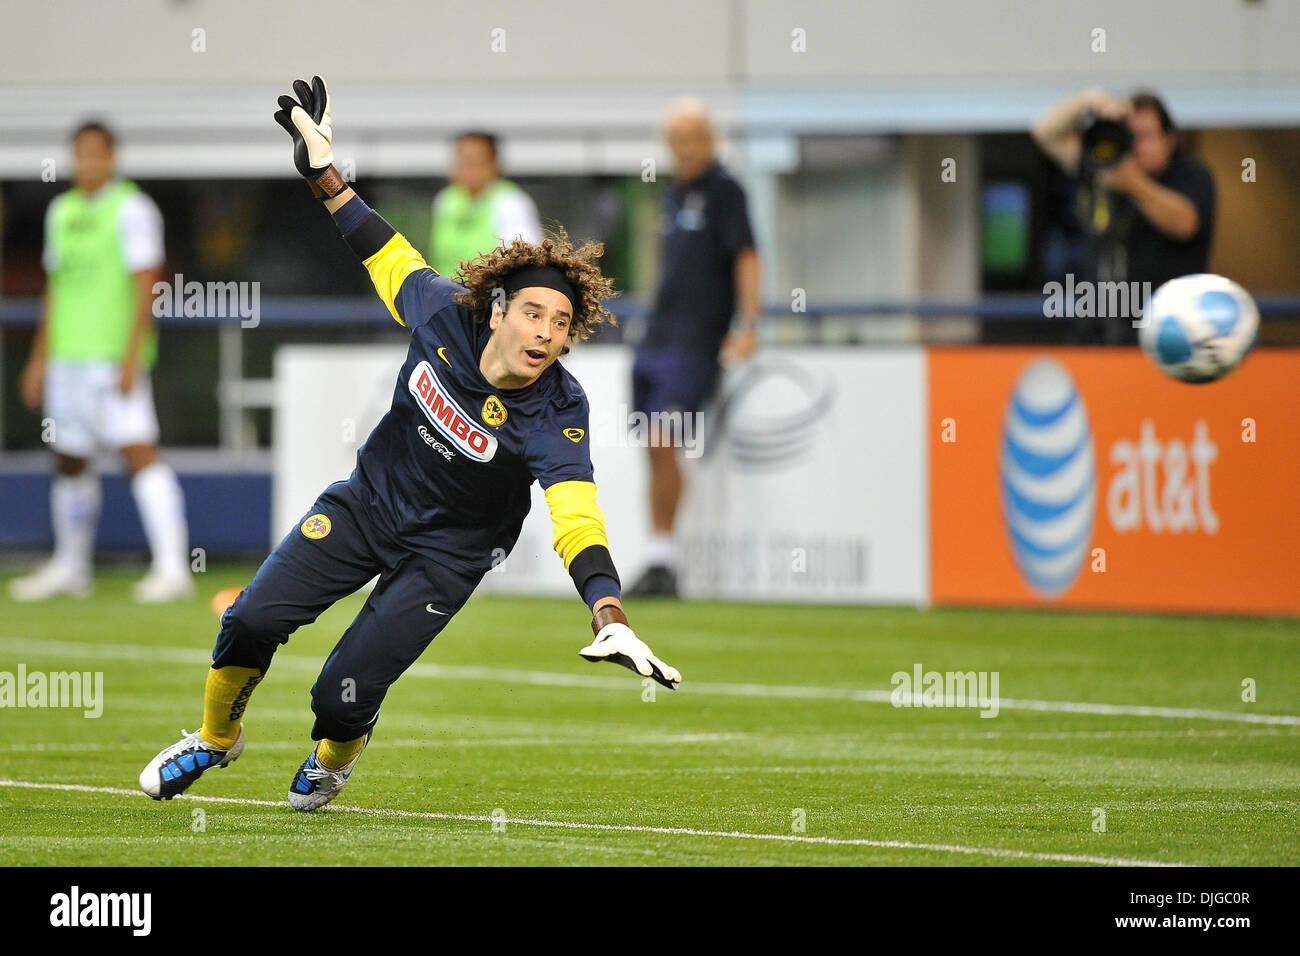 8a12c87b2 Club America goal keeper Ochoa Guillermo  1 during the MLS Club America vs.  San Luis FC game at Cowboys Stadium in Arlington